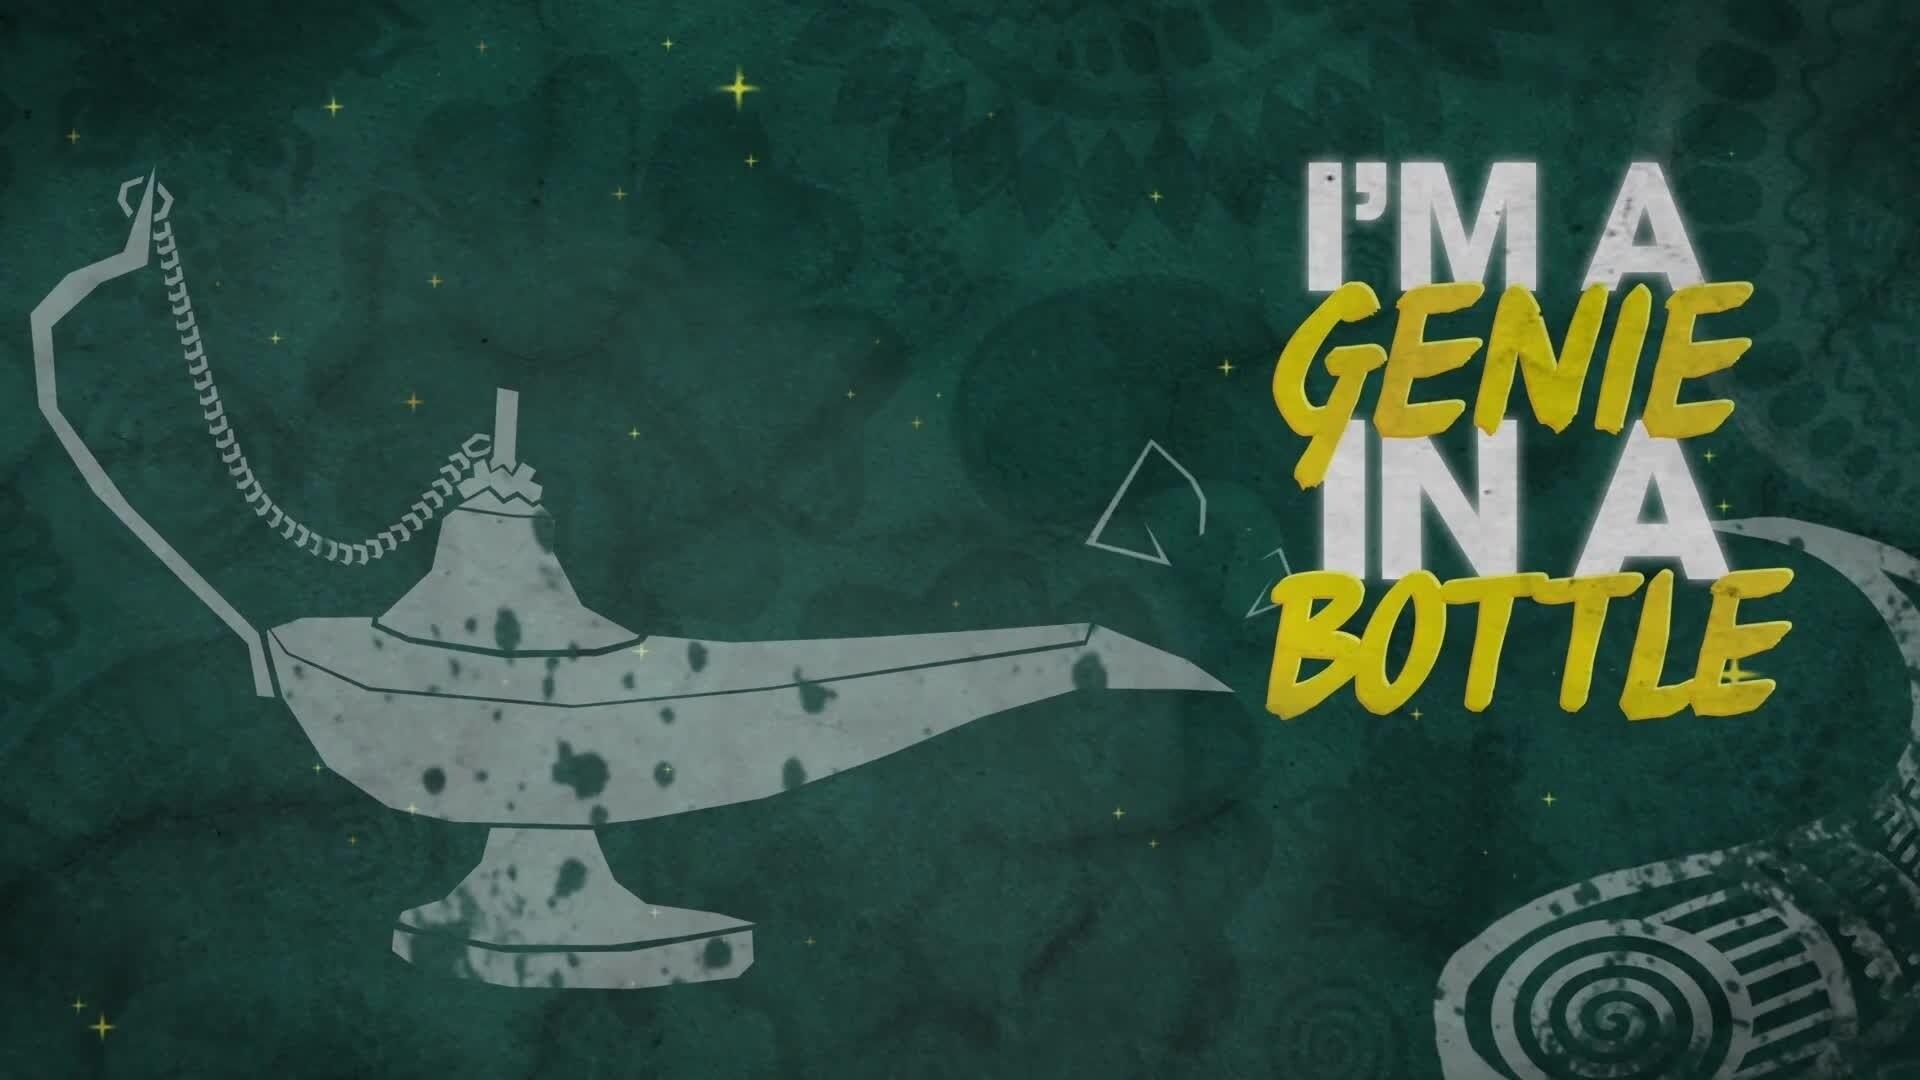 'Genie in a Bottle' Μουσικό Βίντεο με στίχους